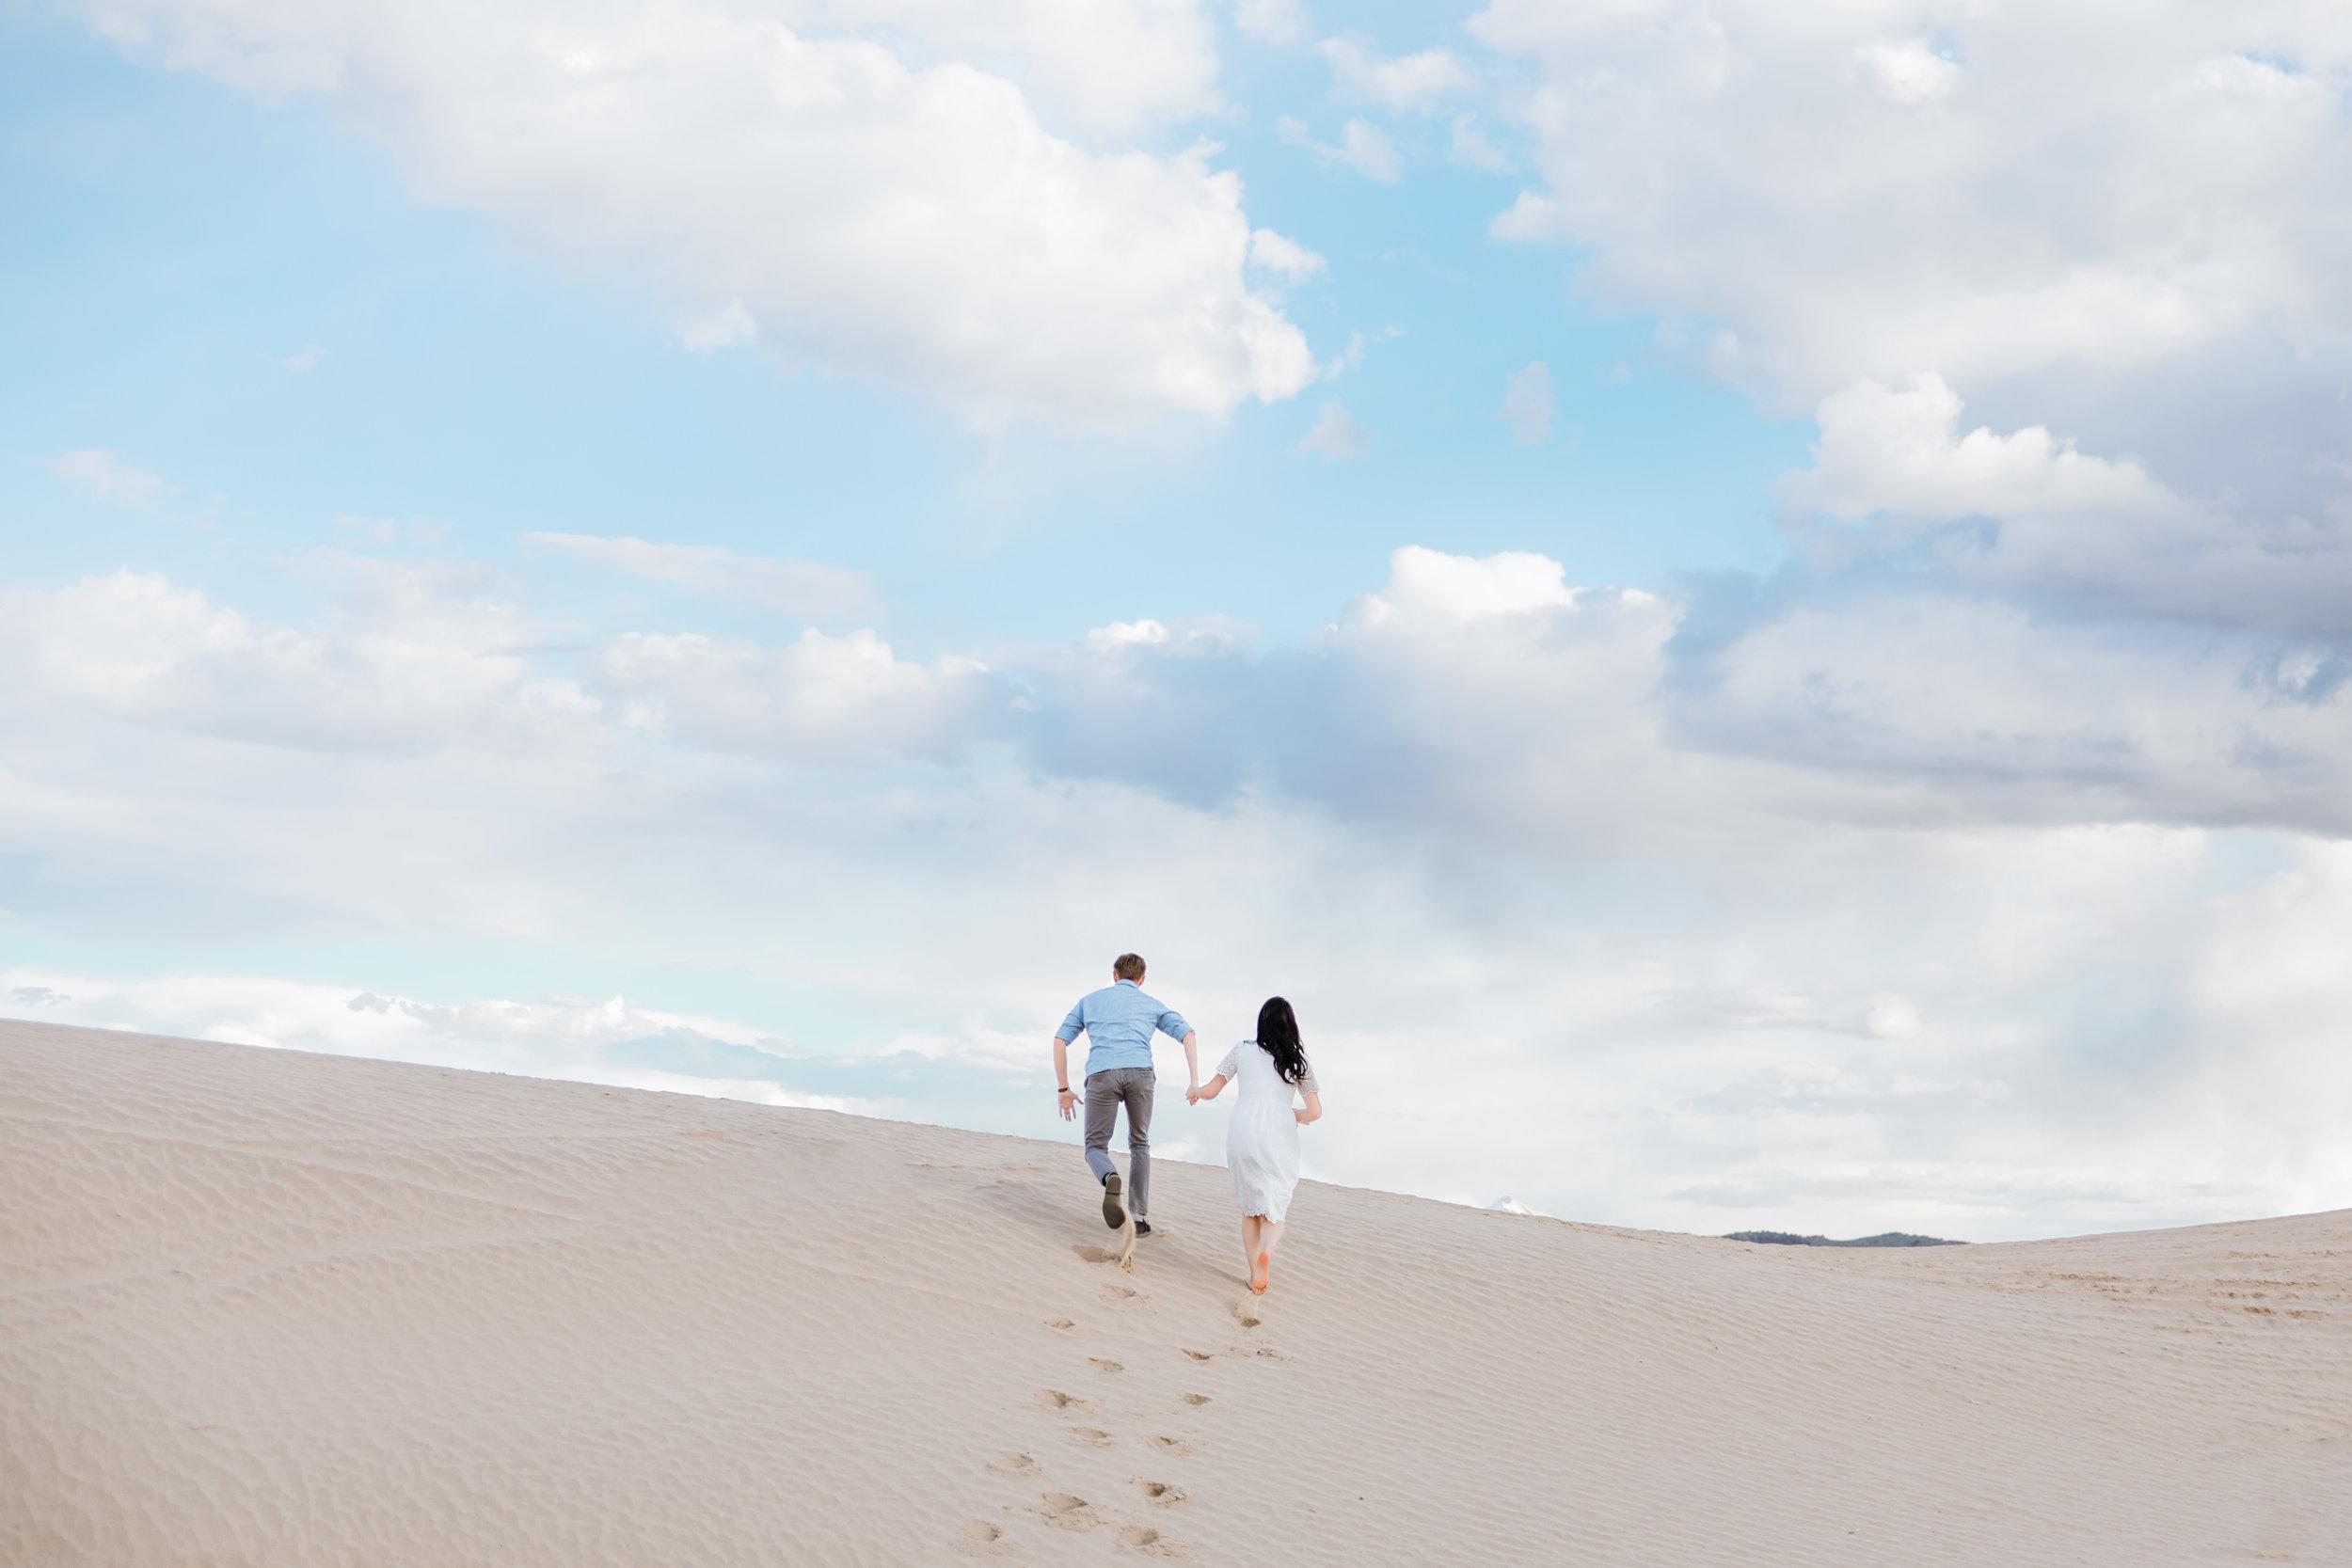 little-sahara-recreation-area-elopement-engagement-wedding-photography-michael-cozzens-6.jpg